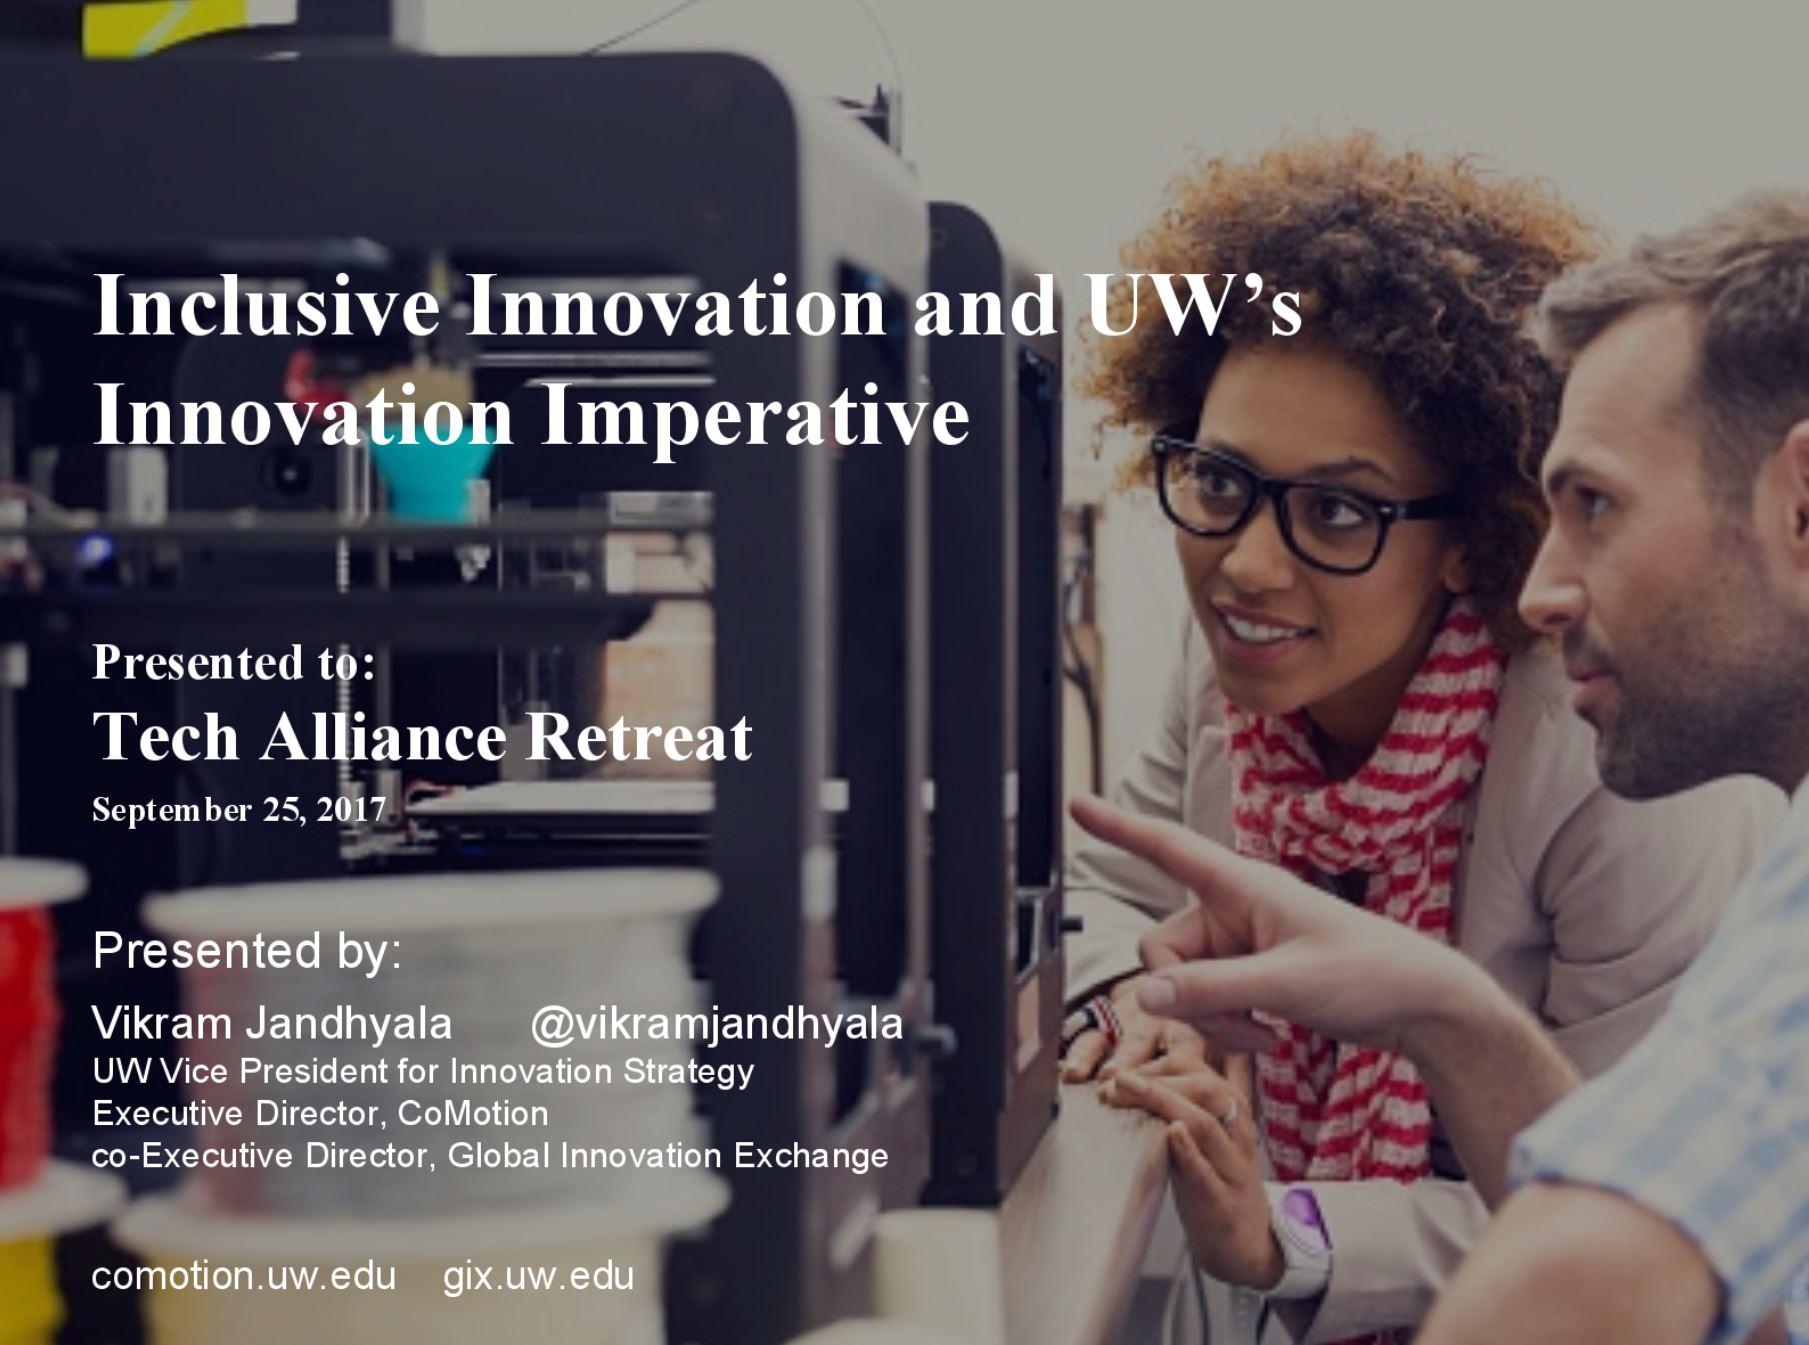 Presenter: Vikram Jandhyala, Vice President for Innovation Strategy, UW; Executive Director of CoMotion; co-Executive Director of the Global Innovation Exchange (GIX)